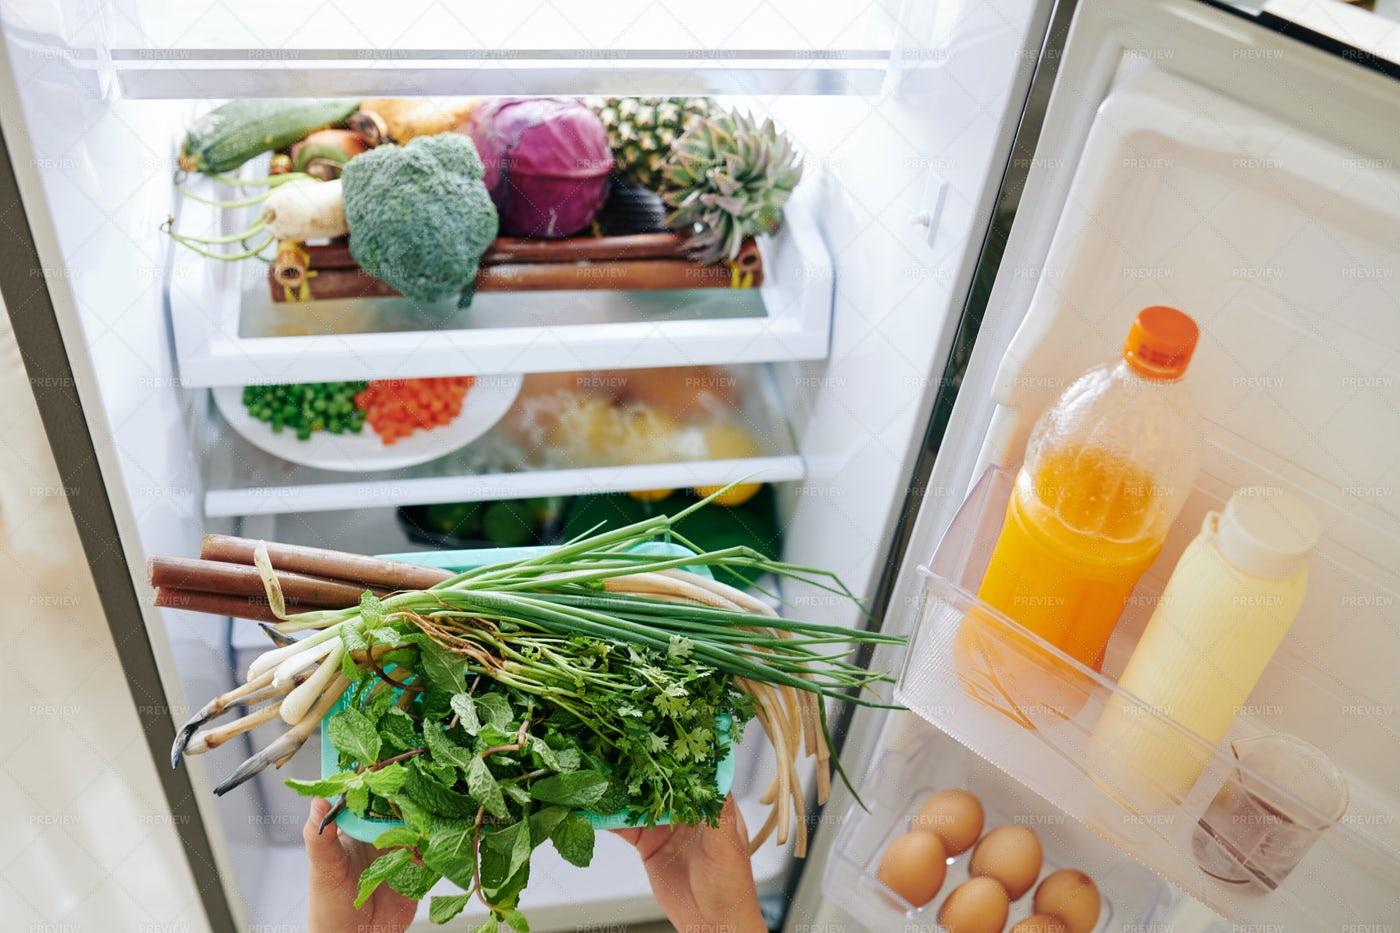 Loading Fridge With Food: Stock Photos